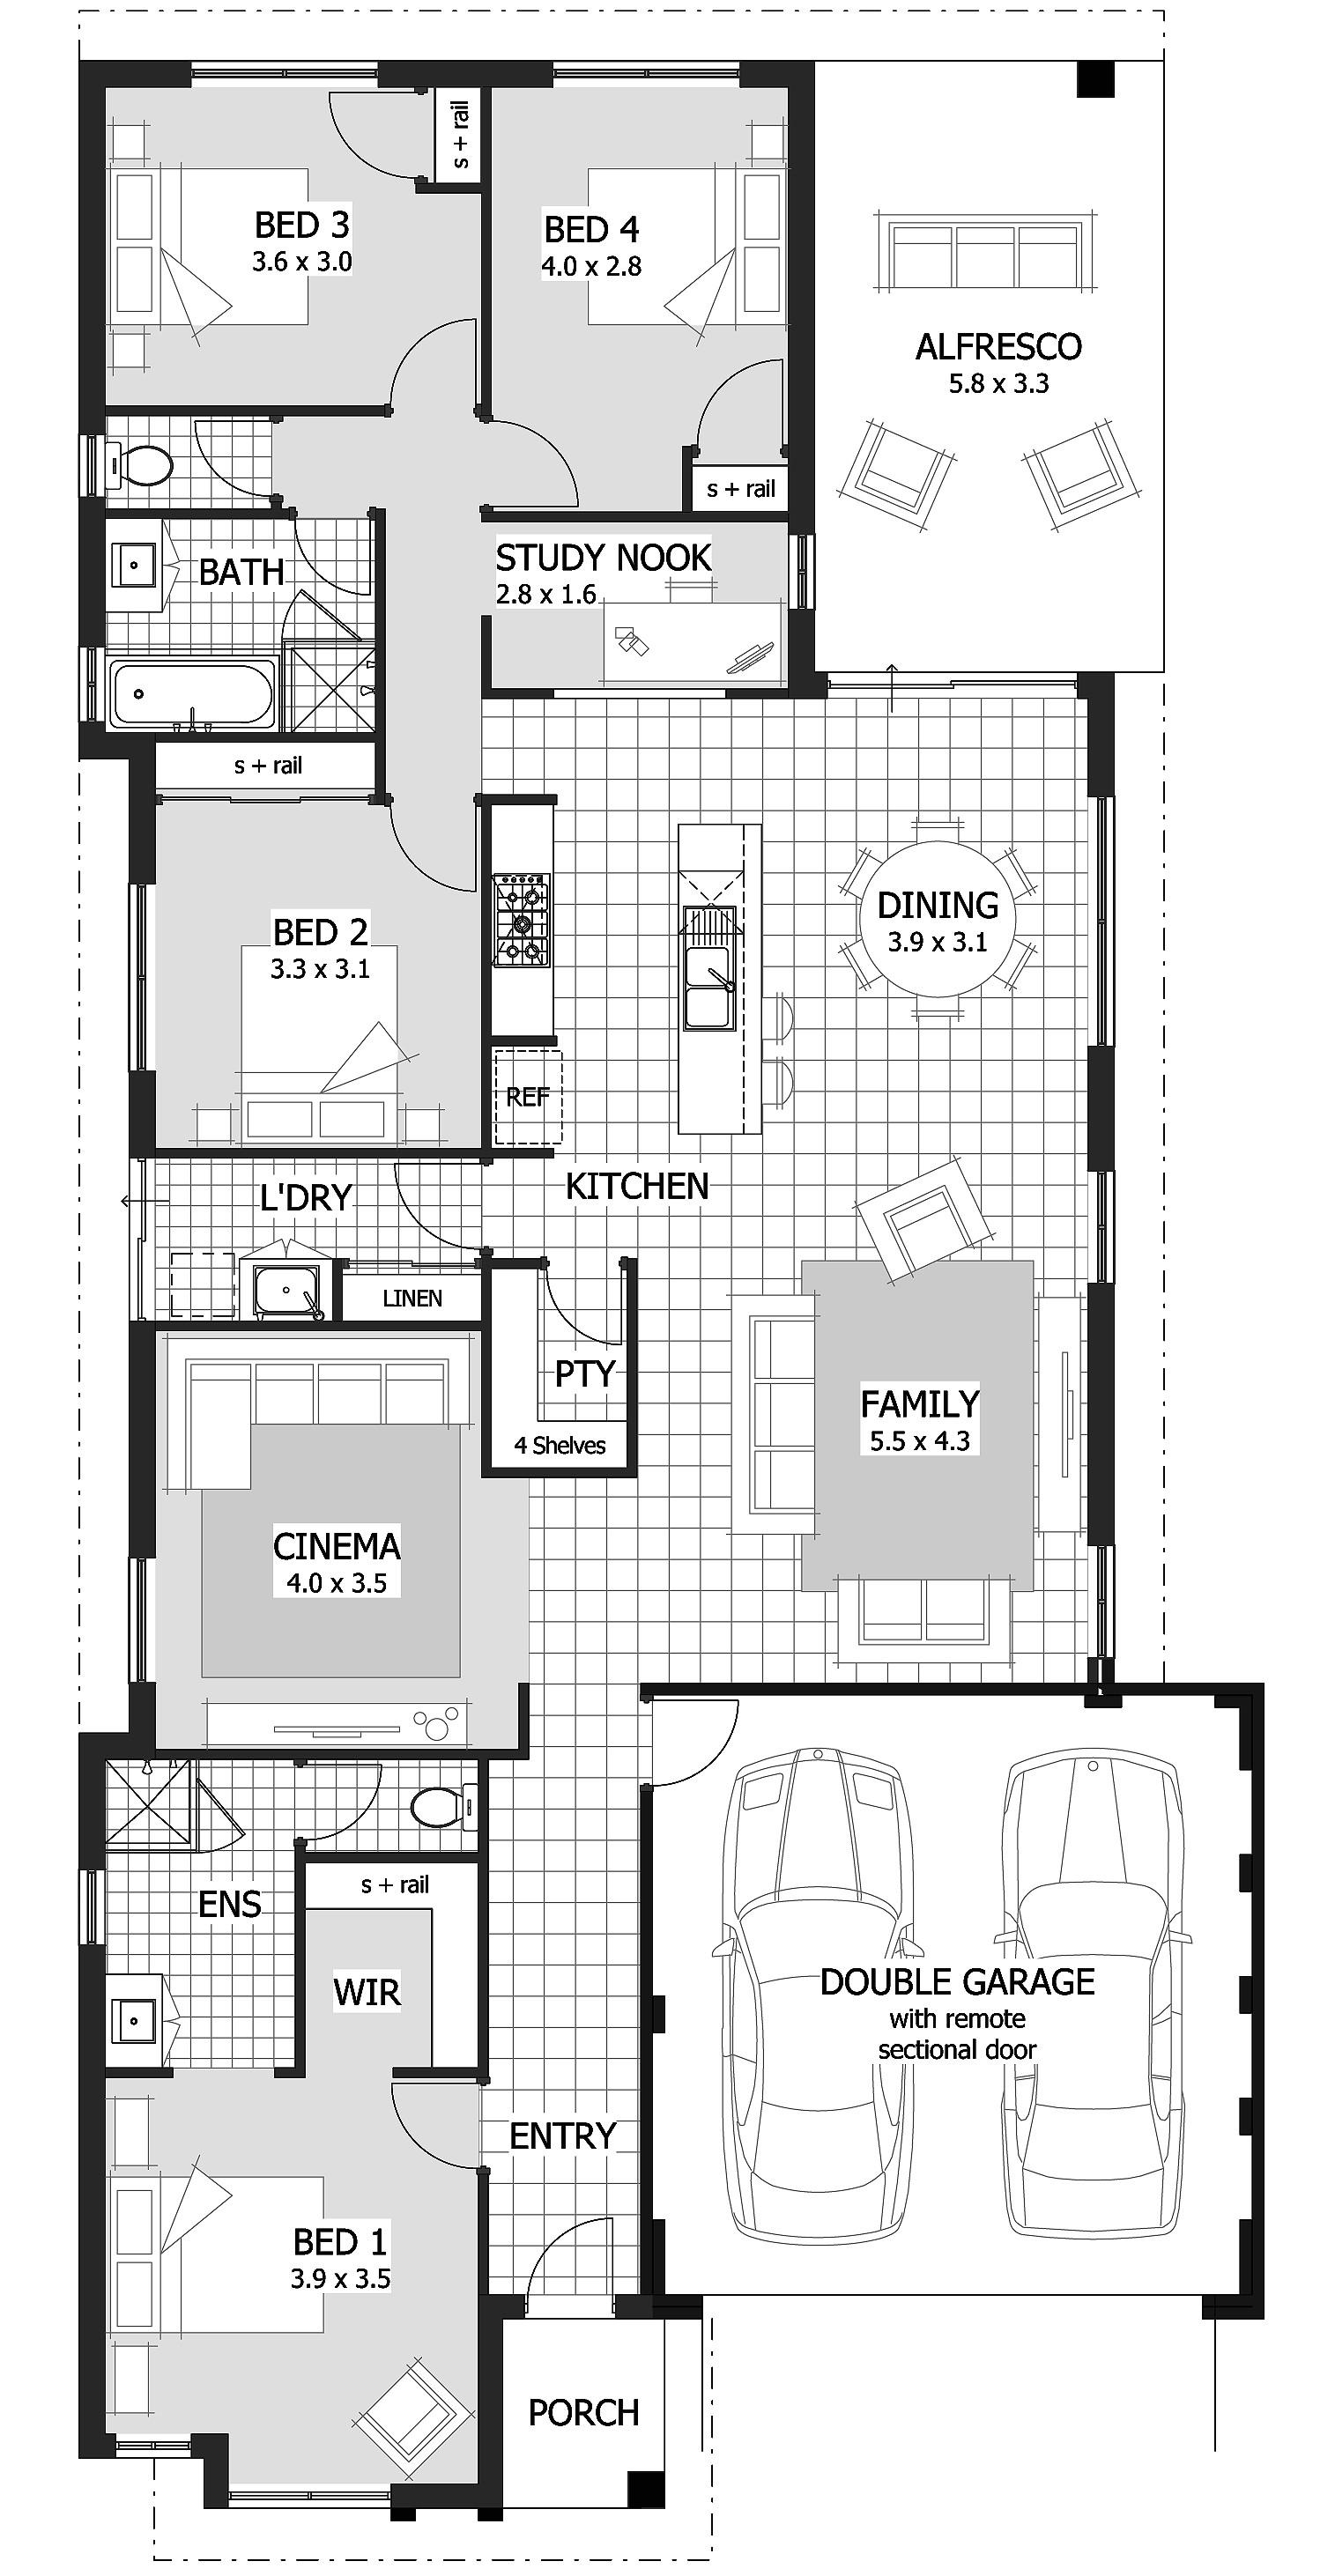 12 metre wide home designs